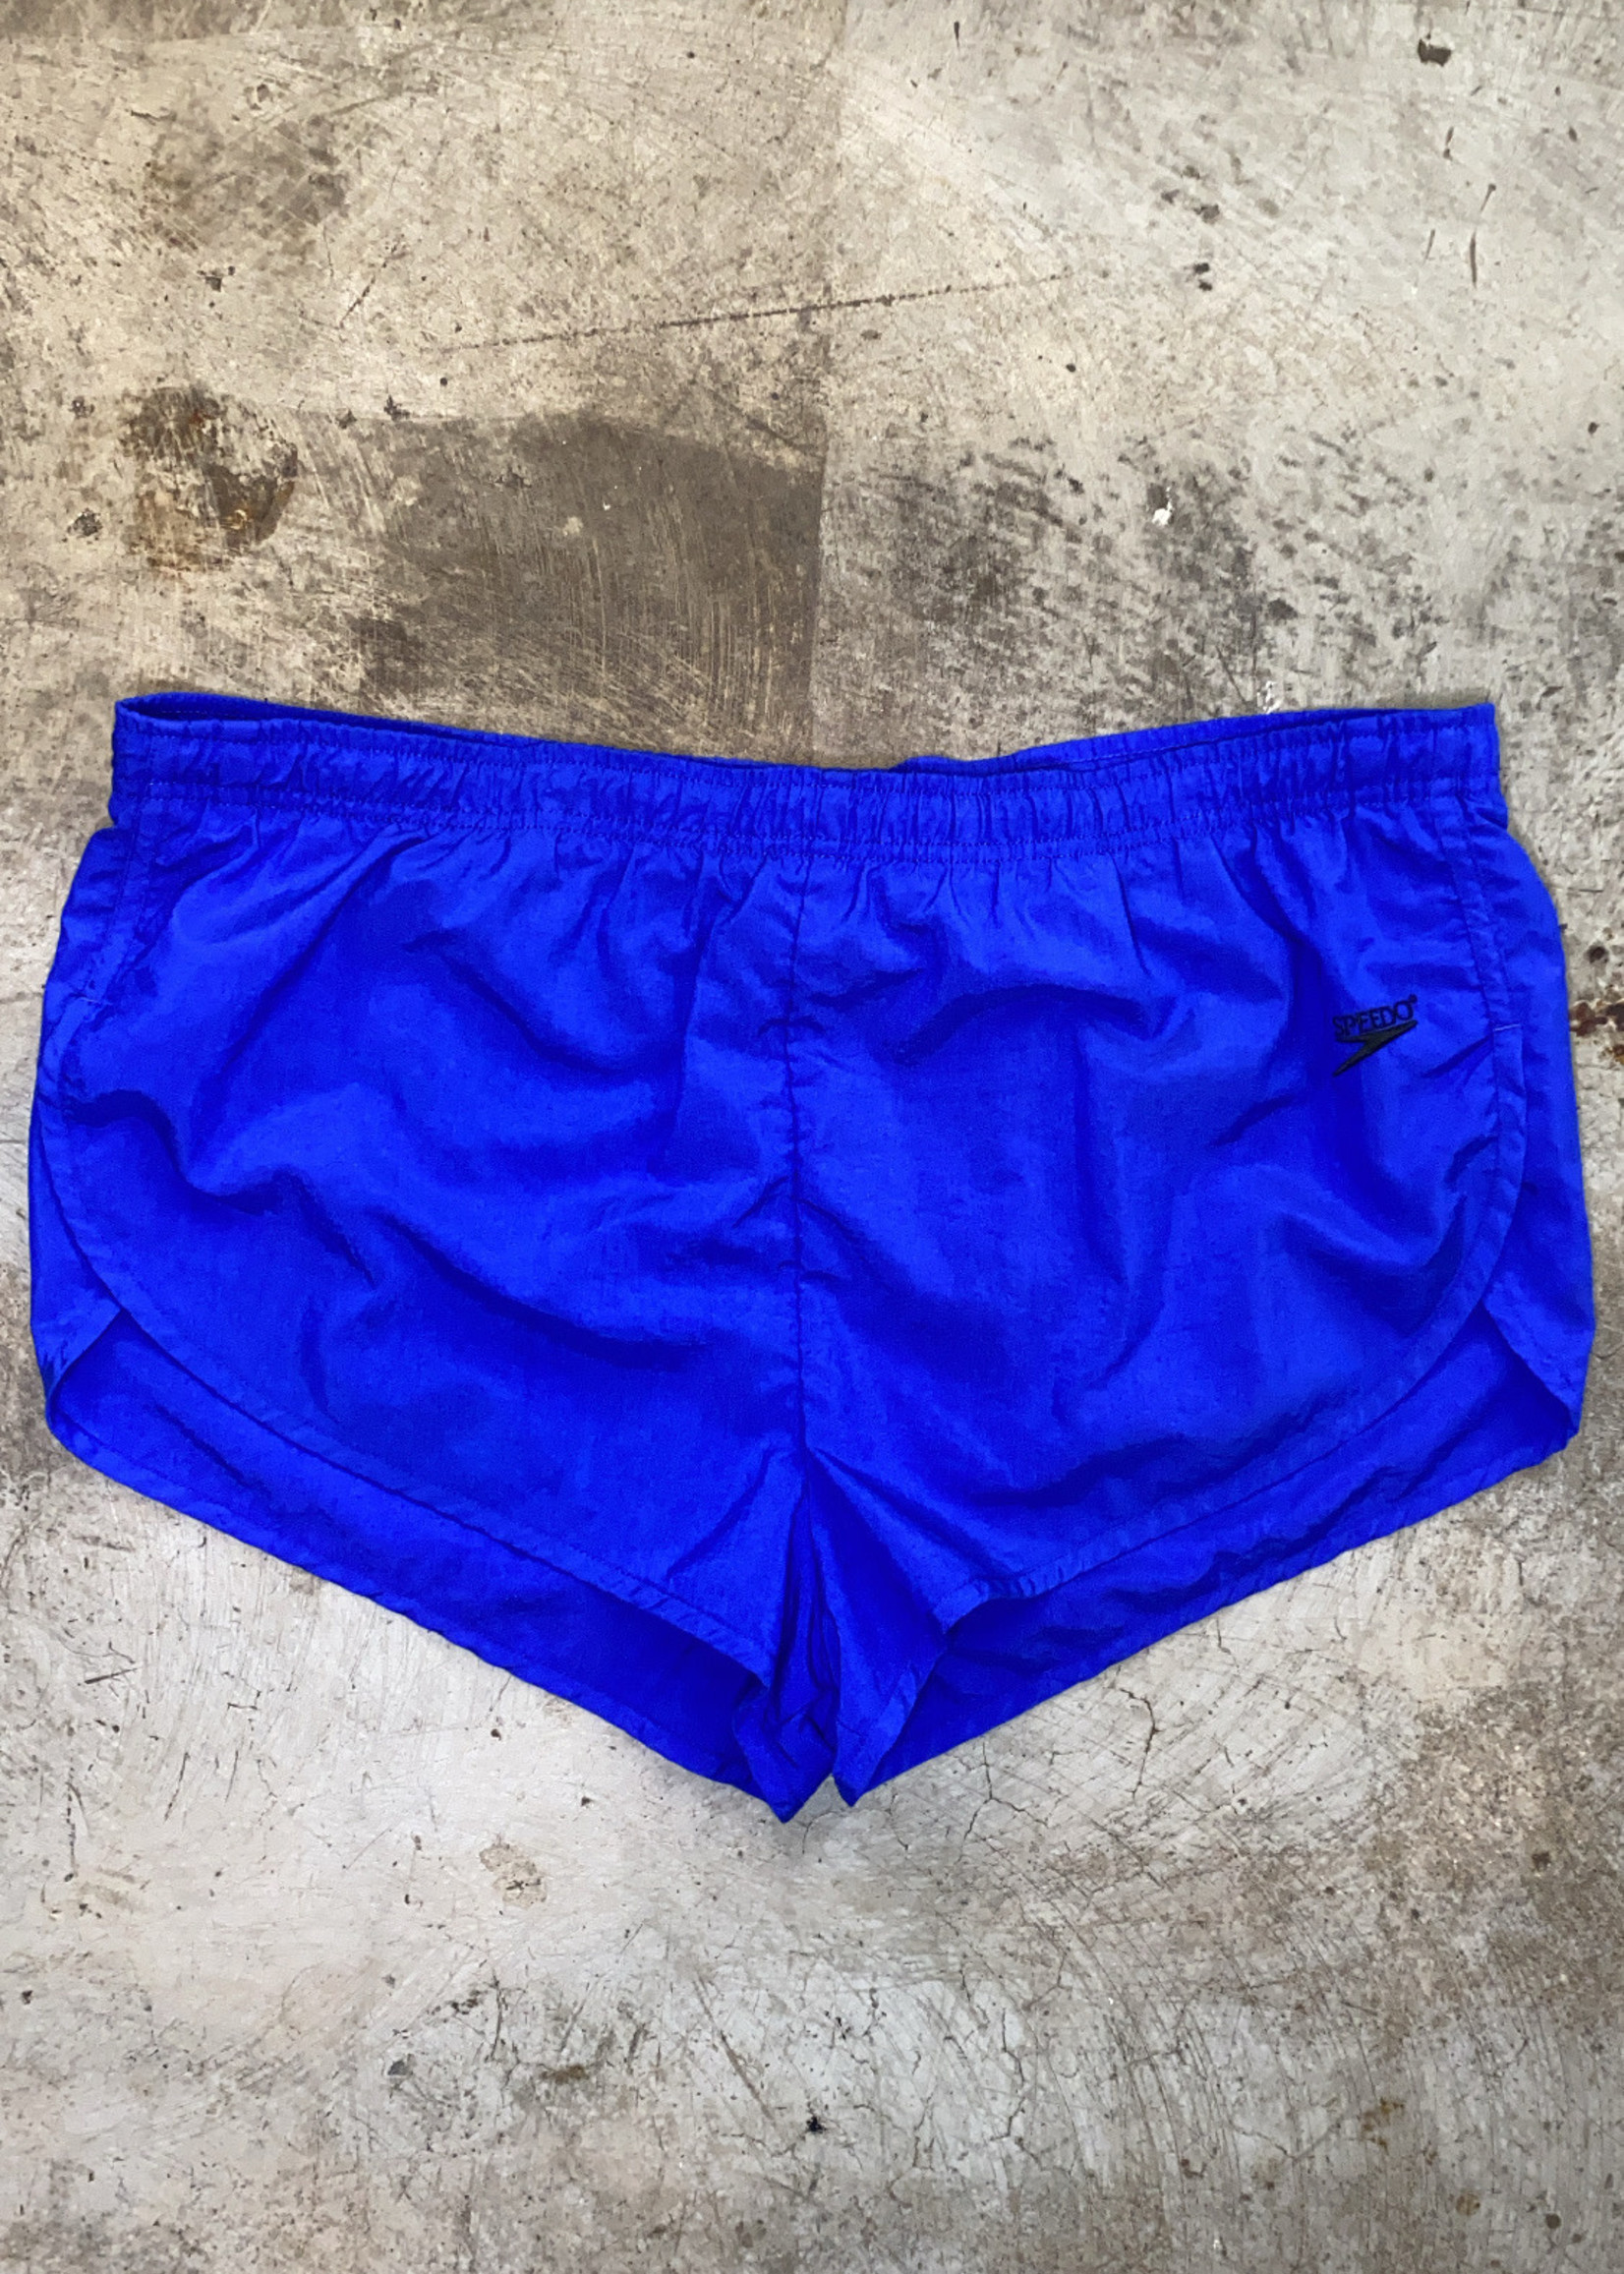 "Vintage Speedo Blue Swim Shorts 40"""